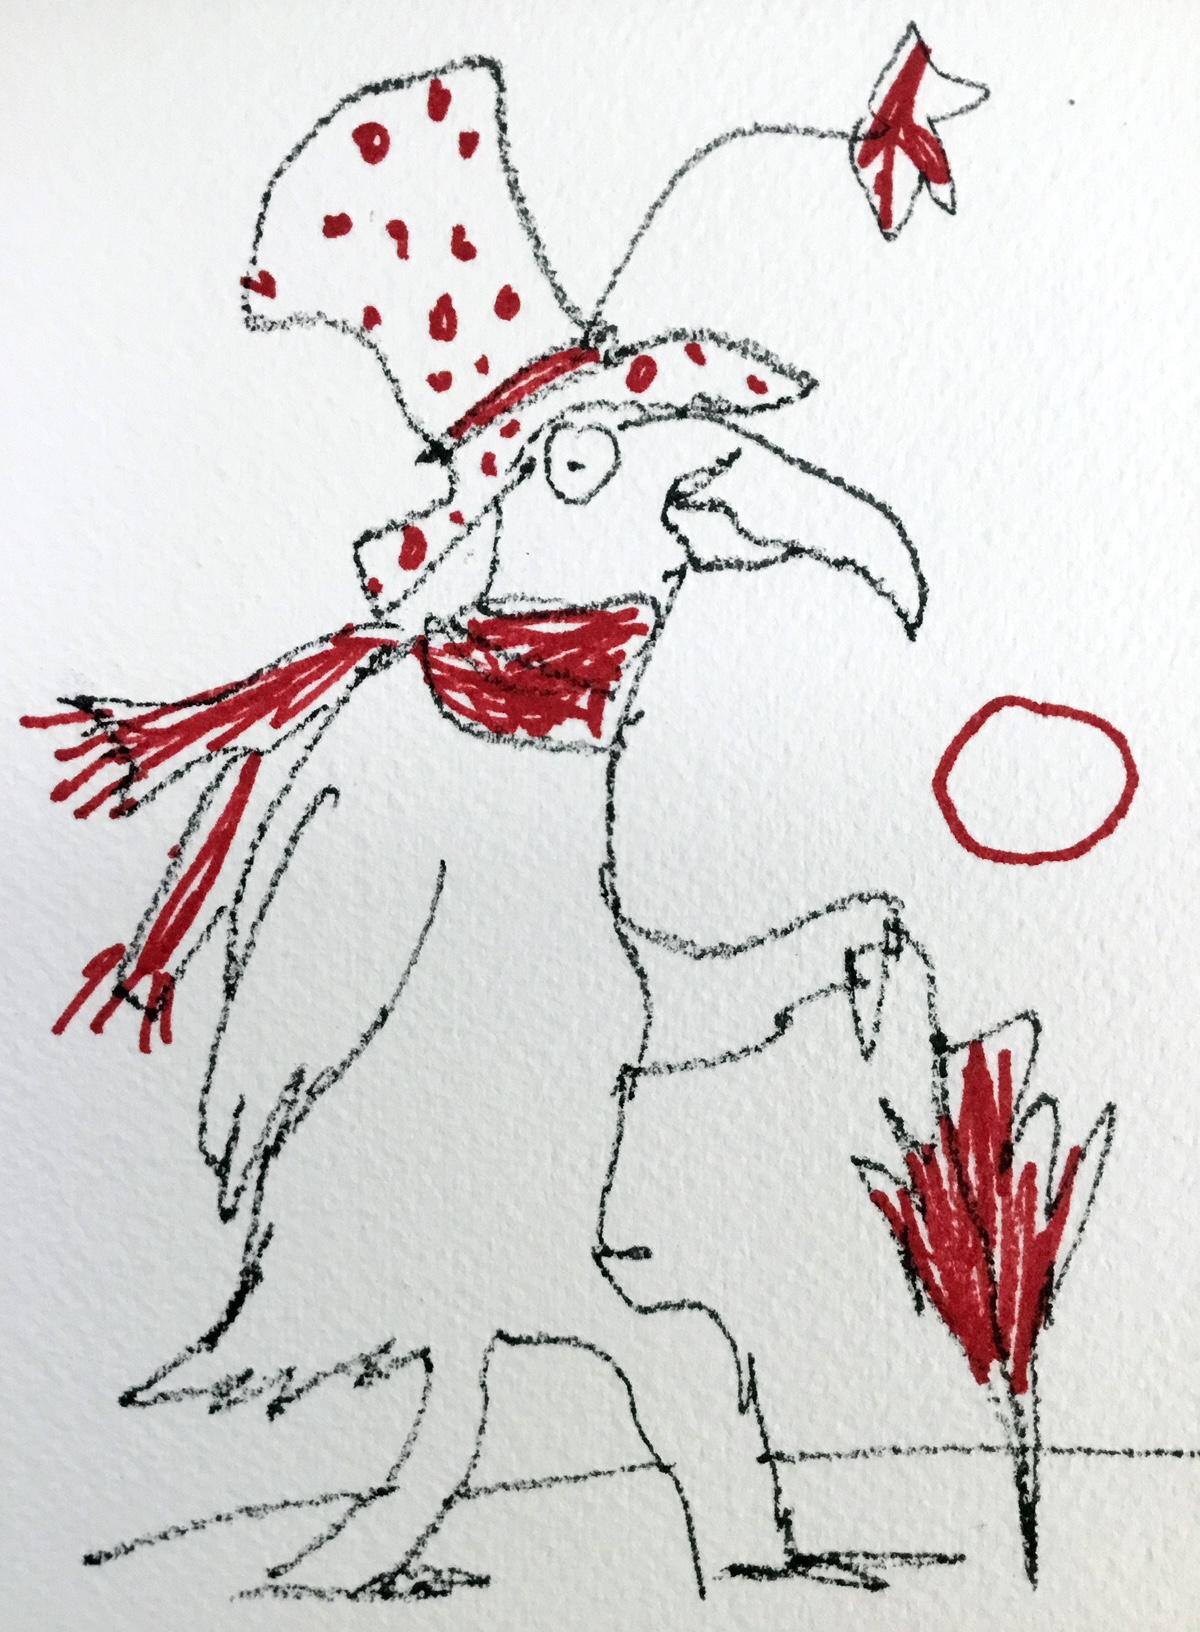 460 Drawing 01.jpg